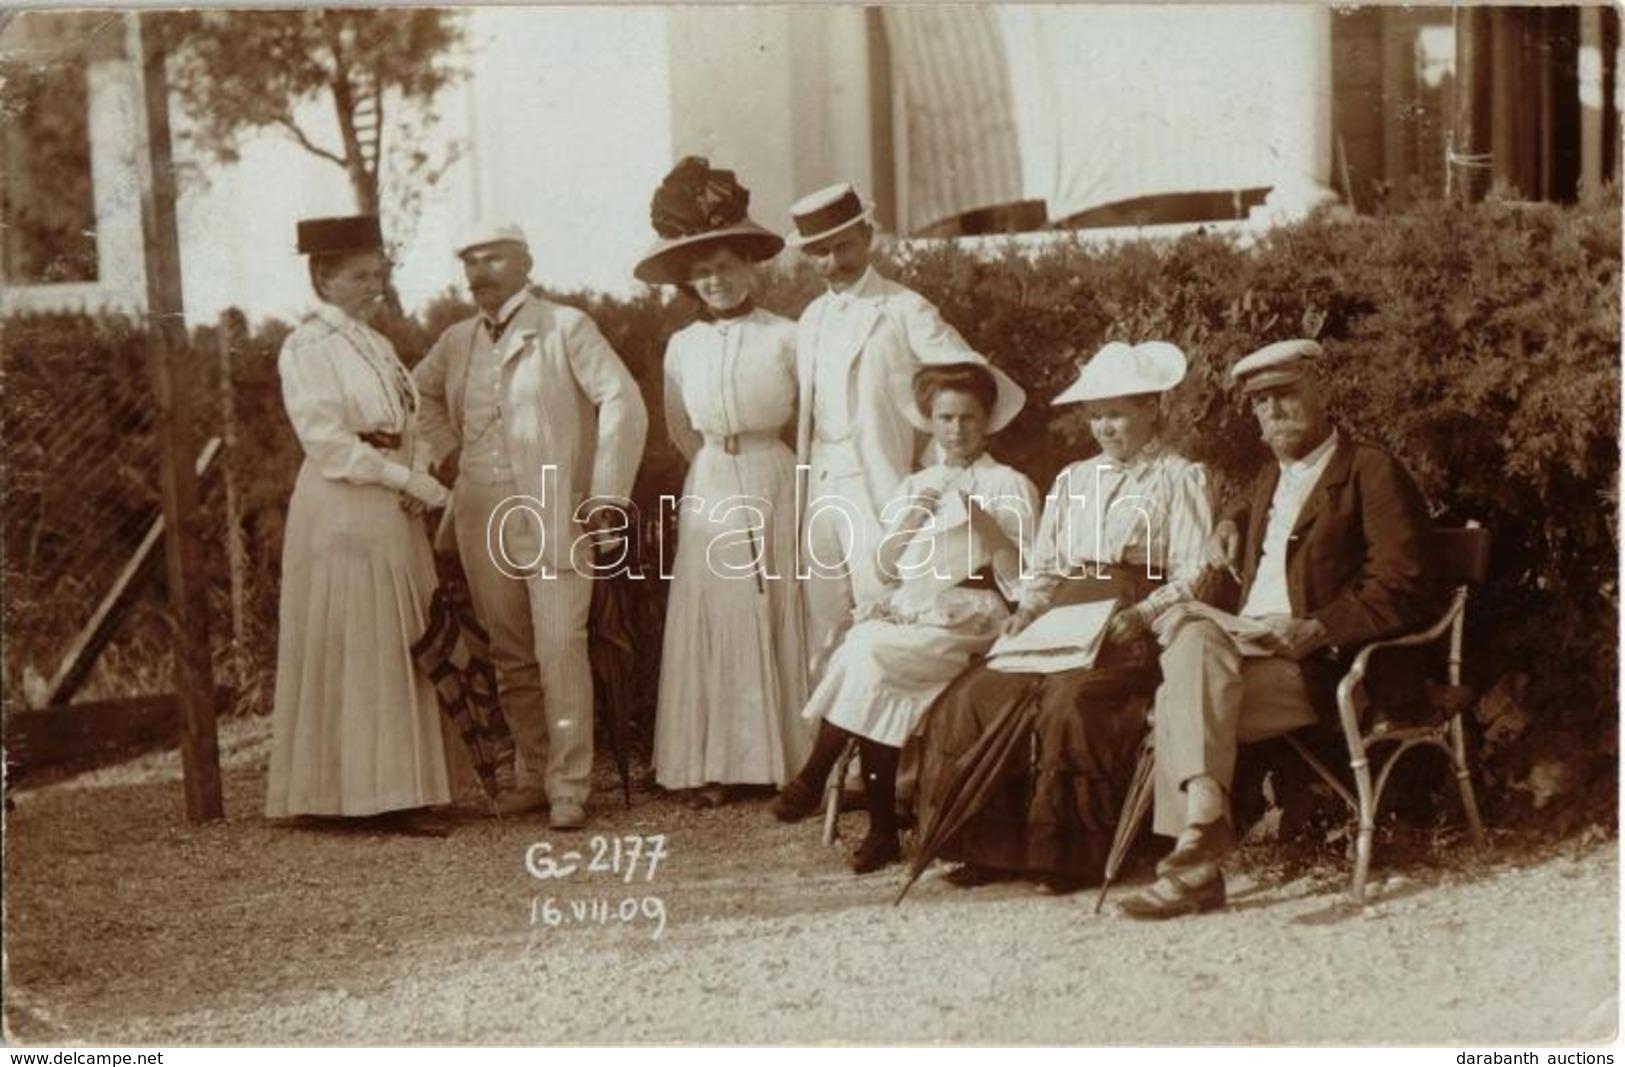 T2/T3 1909 Grado, Ladies And Gentlemen At The Beach. Strand-Atelier Wessely Photo (EK) - Postcards